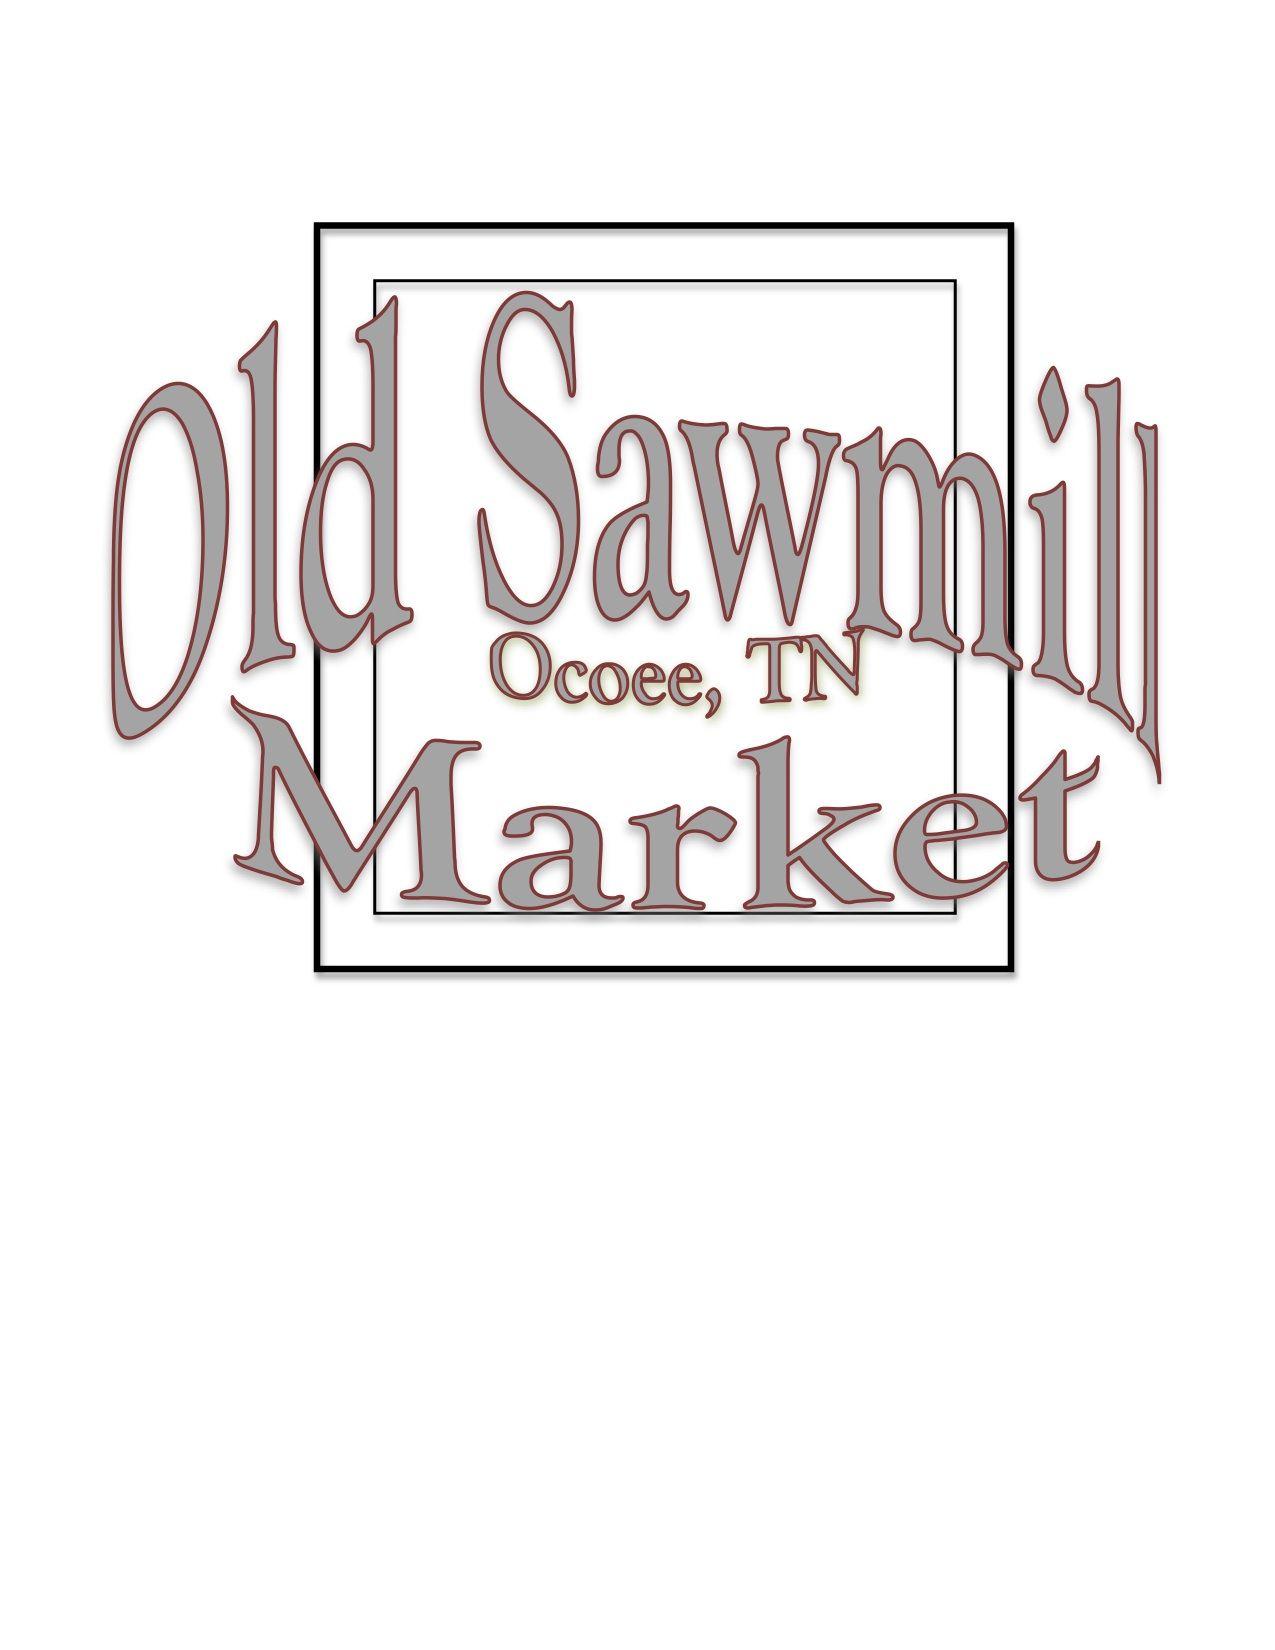 old sawmill market ocoee tn - Google Search